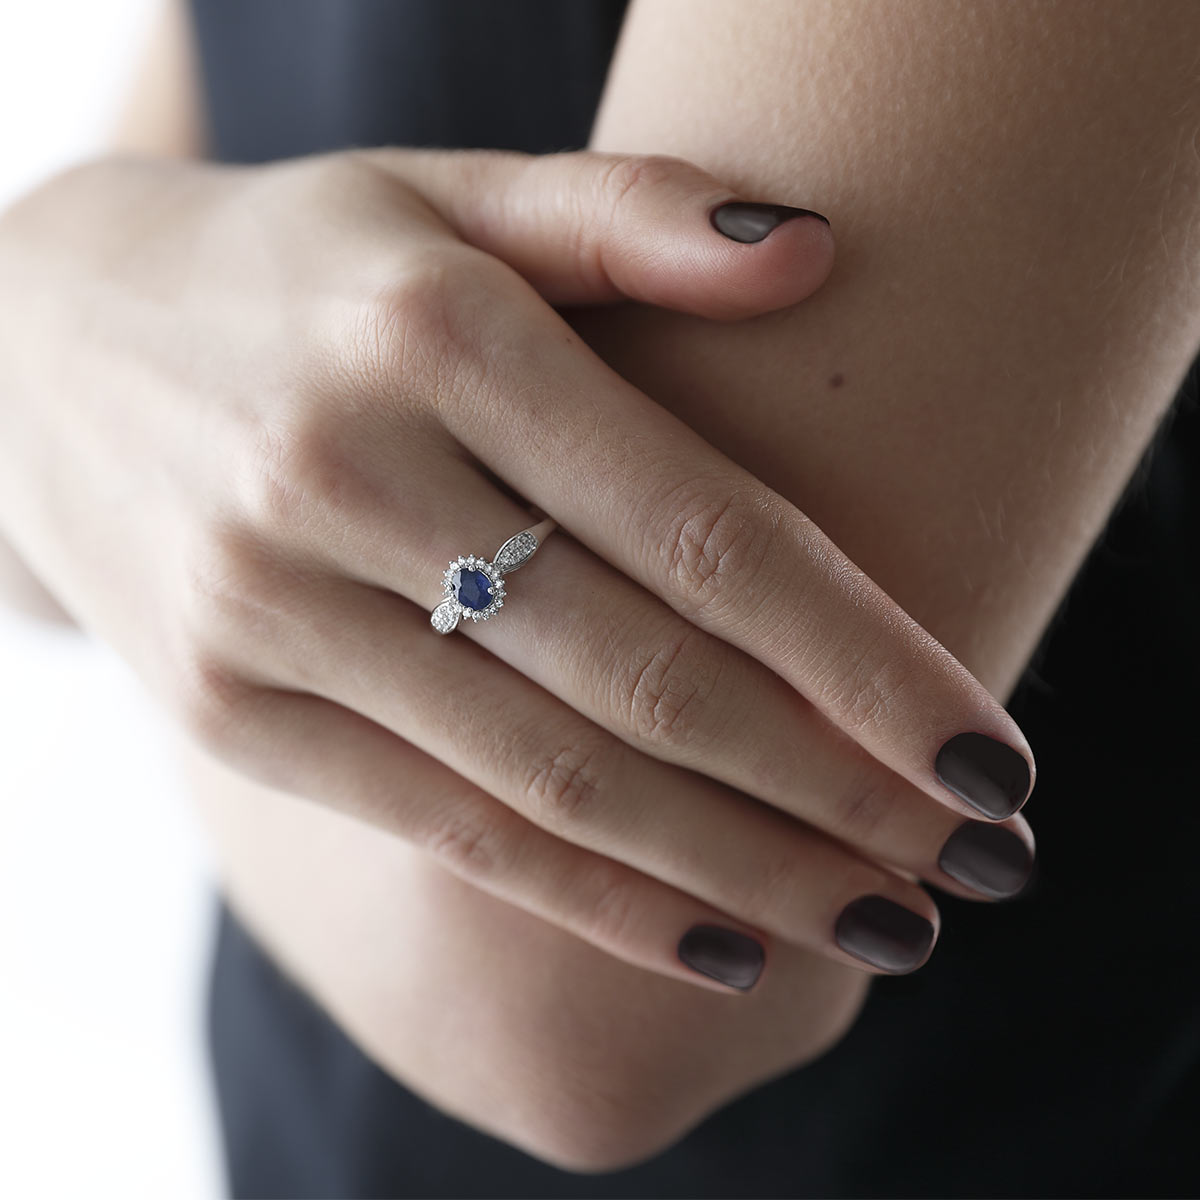 bague or 750 blanc saphir et diamant femme bague maty. Black Bedroom Furniture Sets. Home Design Ideas